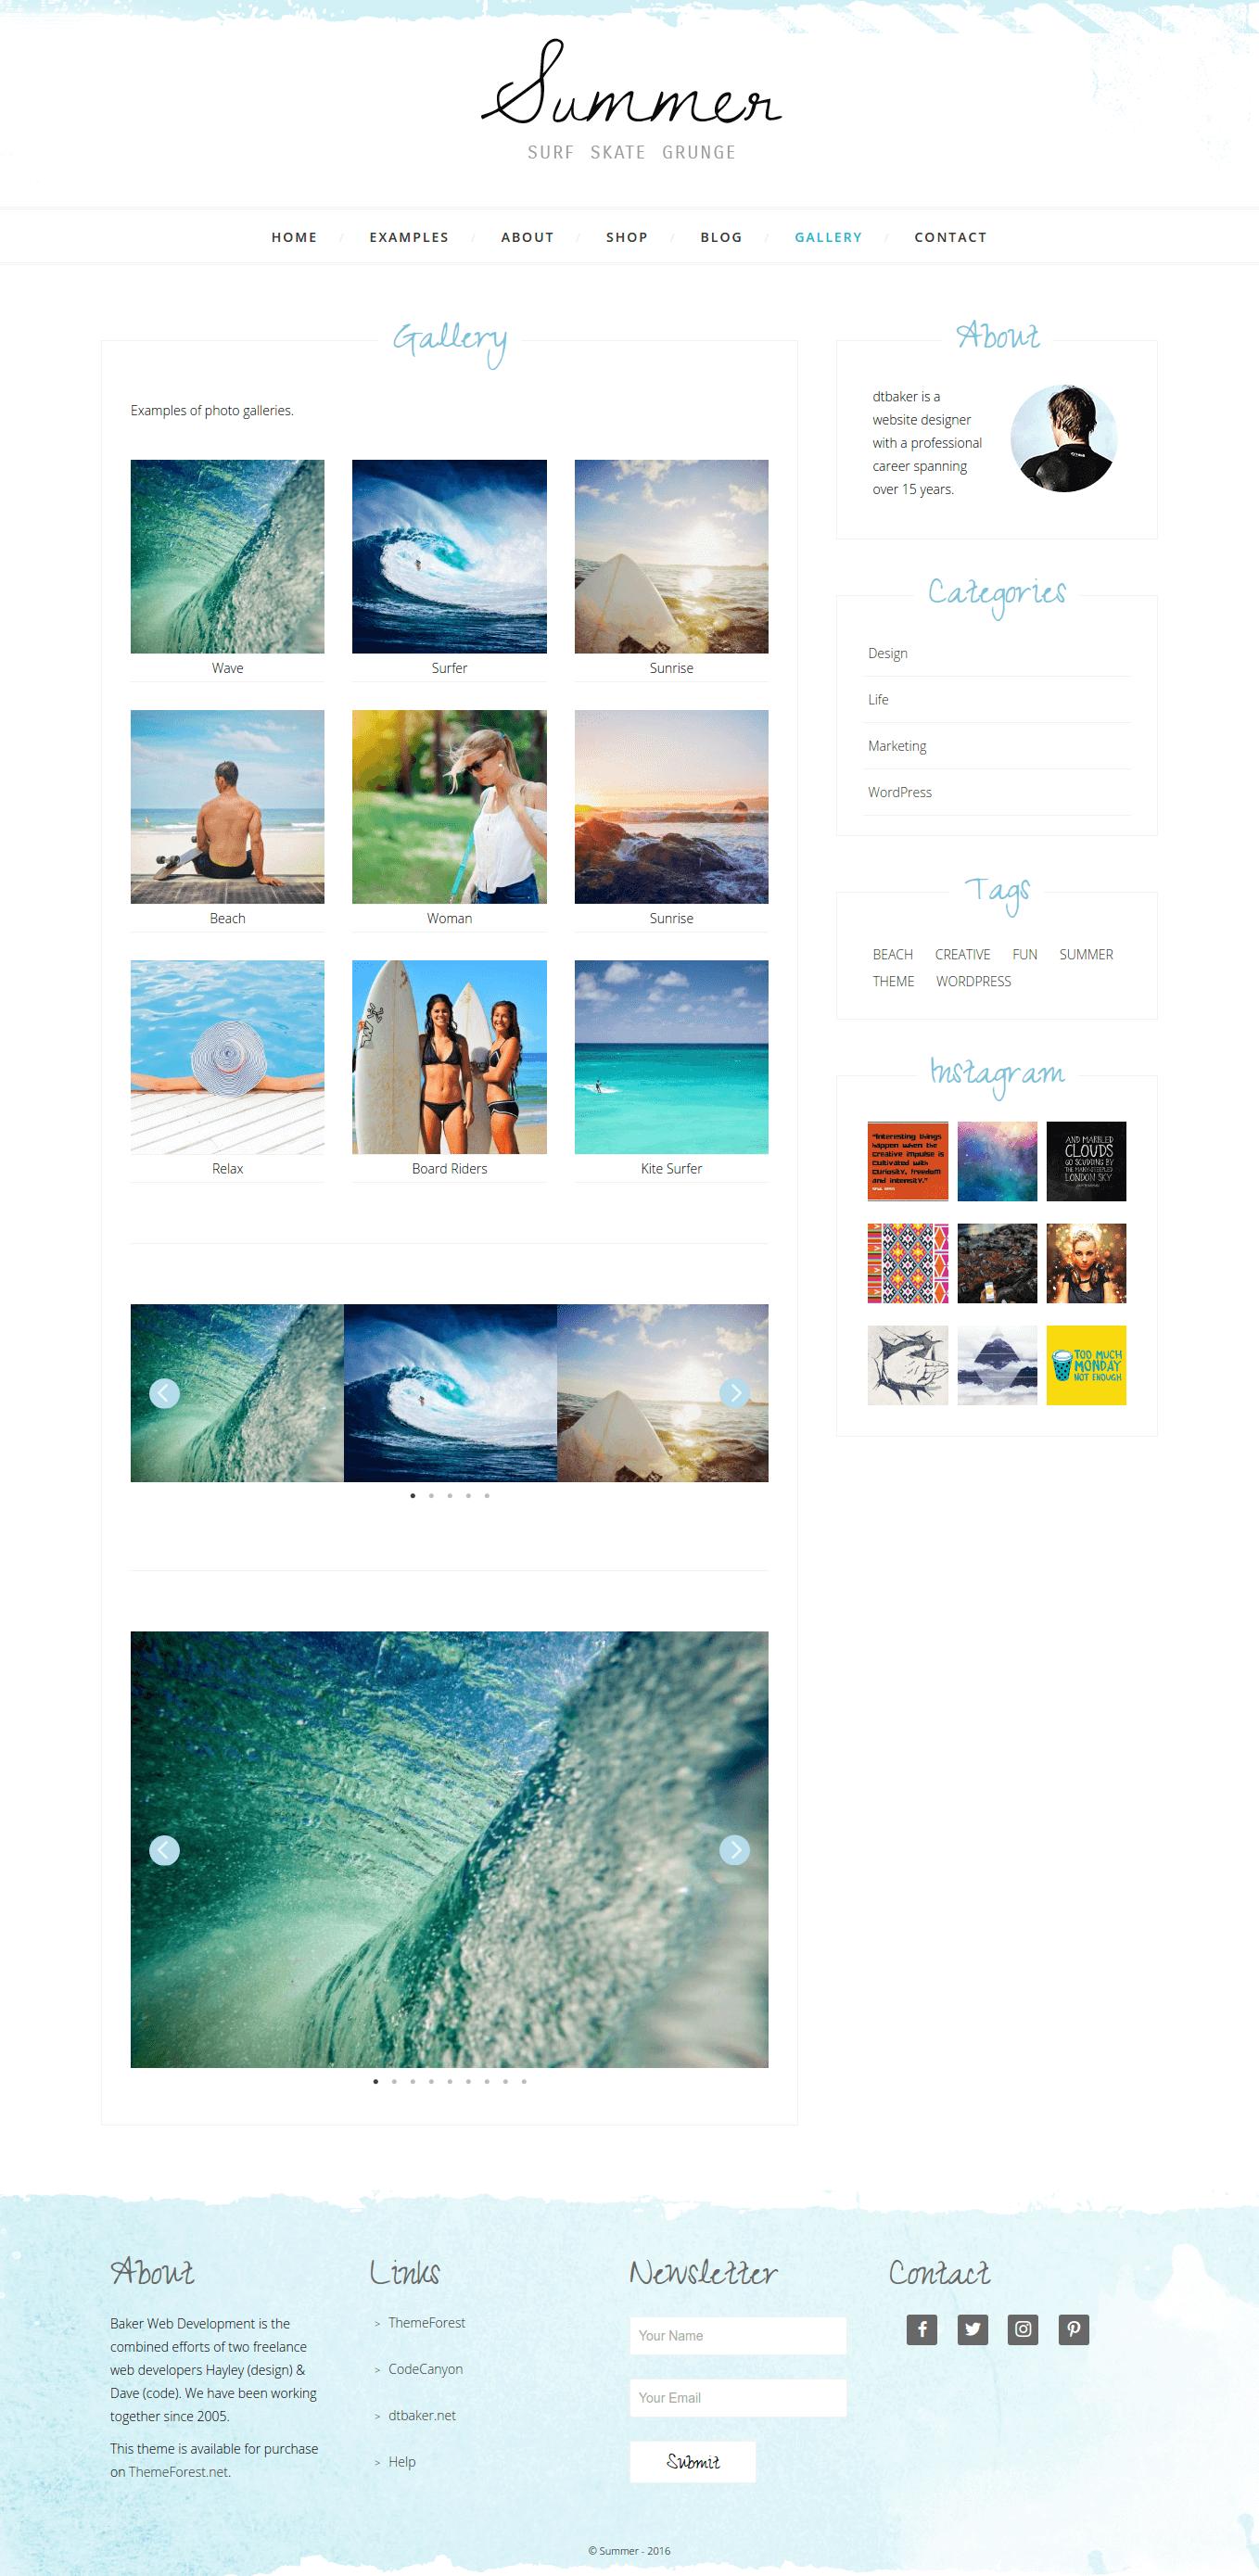 Summer Surf Beach Grunge Blog Shop